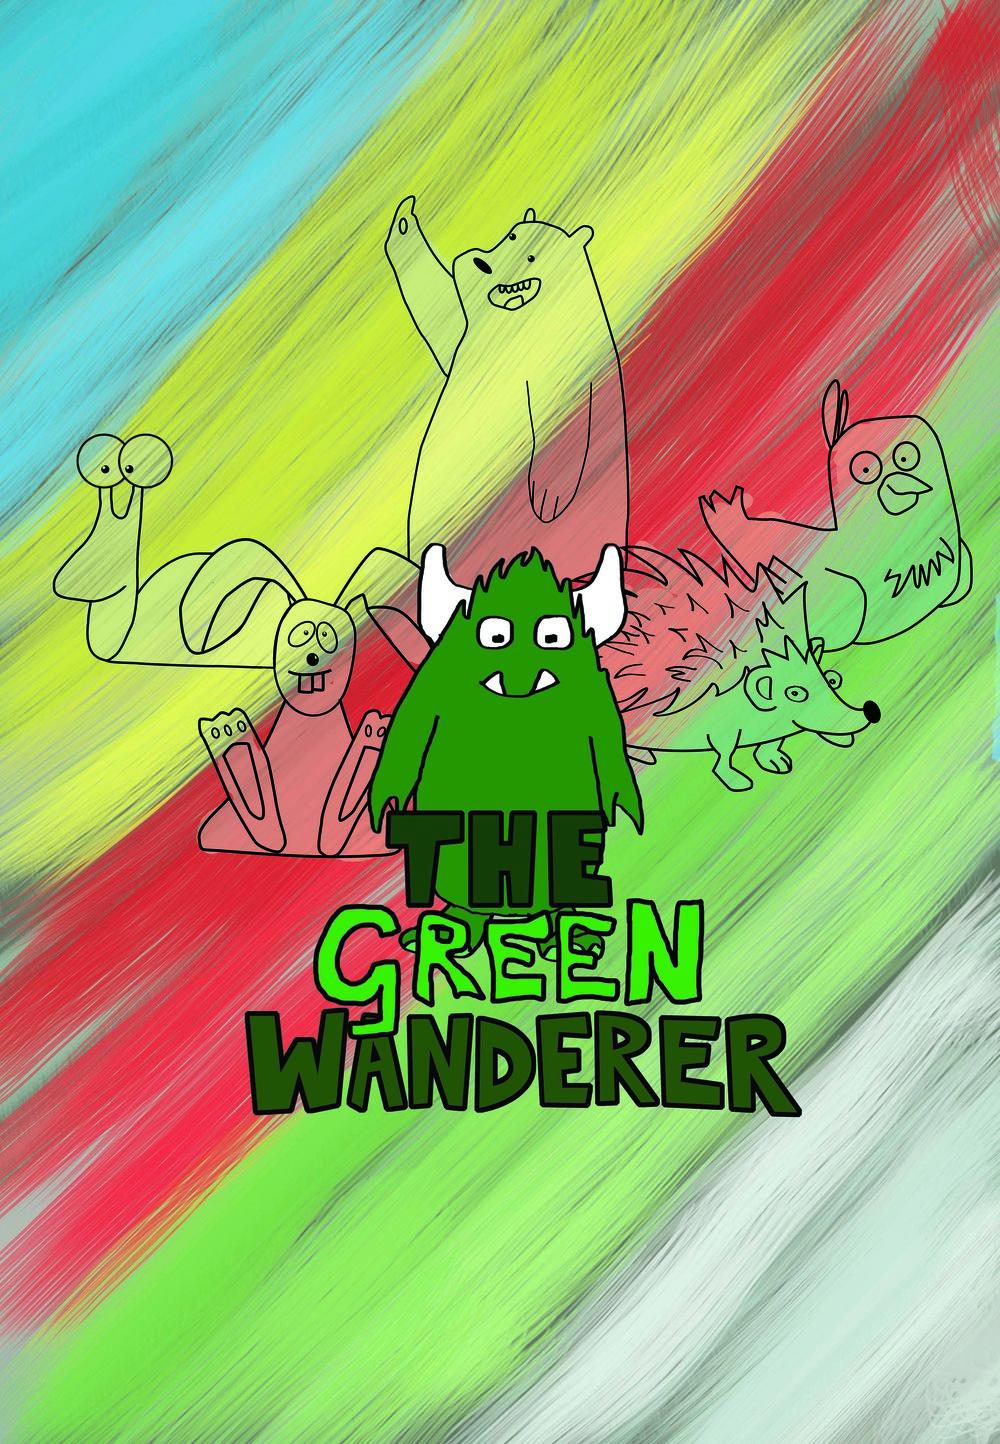 thegreenwanderer_small.jpg